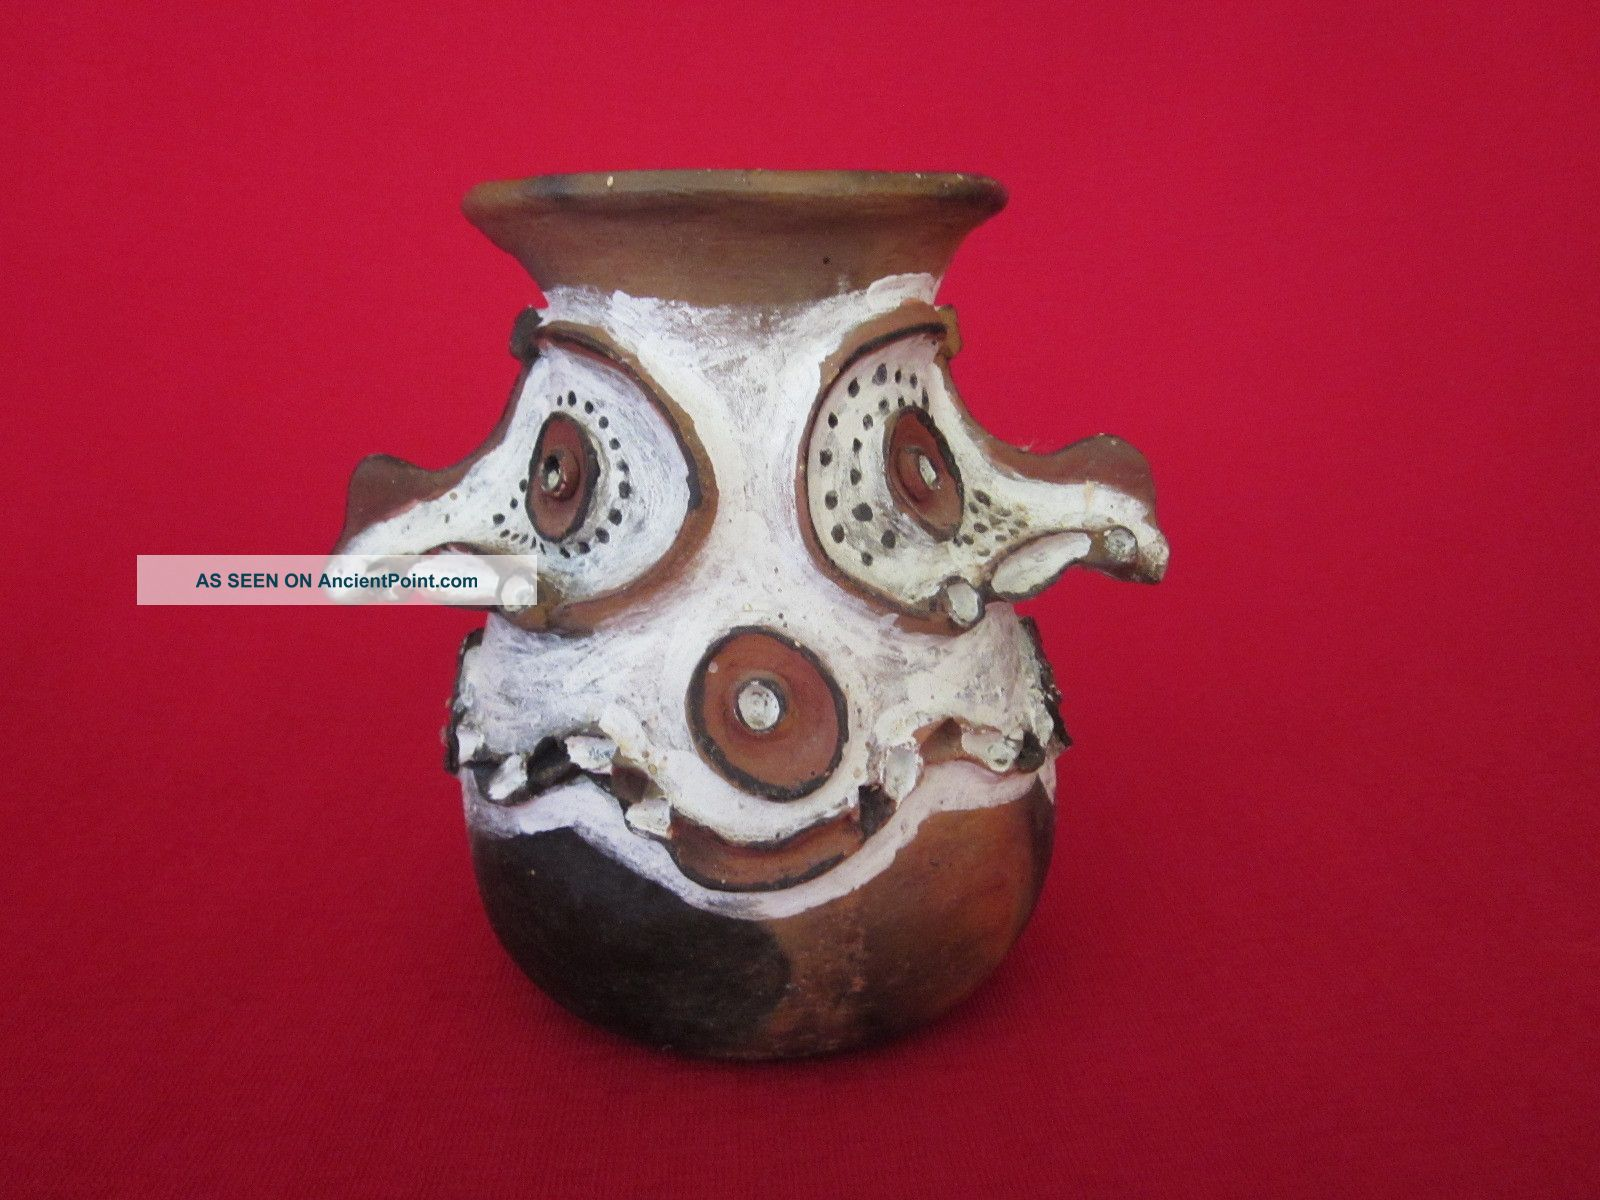 Vintage Papua New Guinea Sepik Clay Sago Pot,  Aibom,  Handmade Pacific Islands & Oceania photo